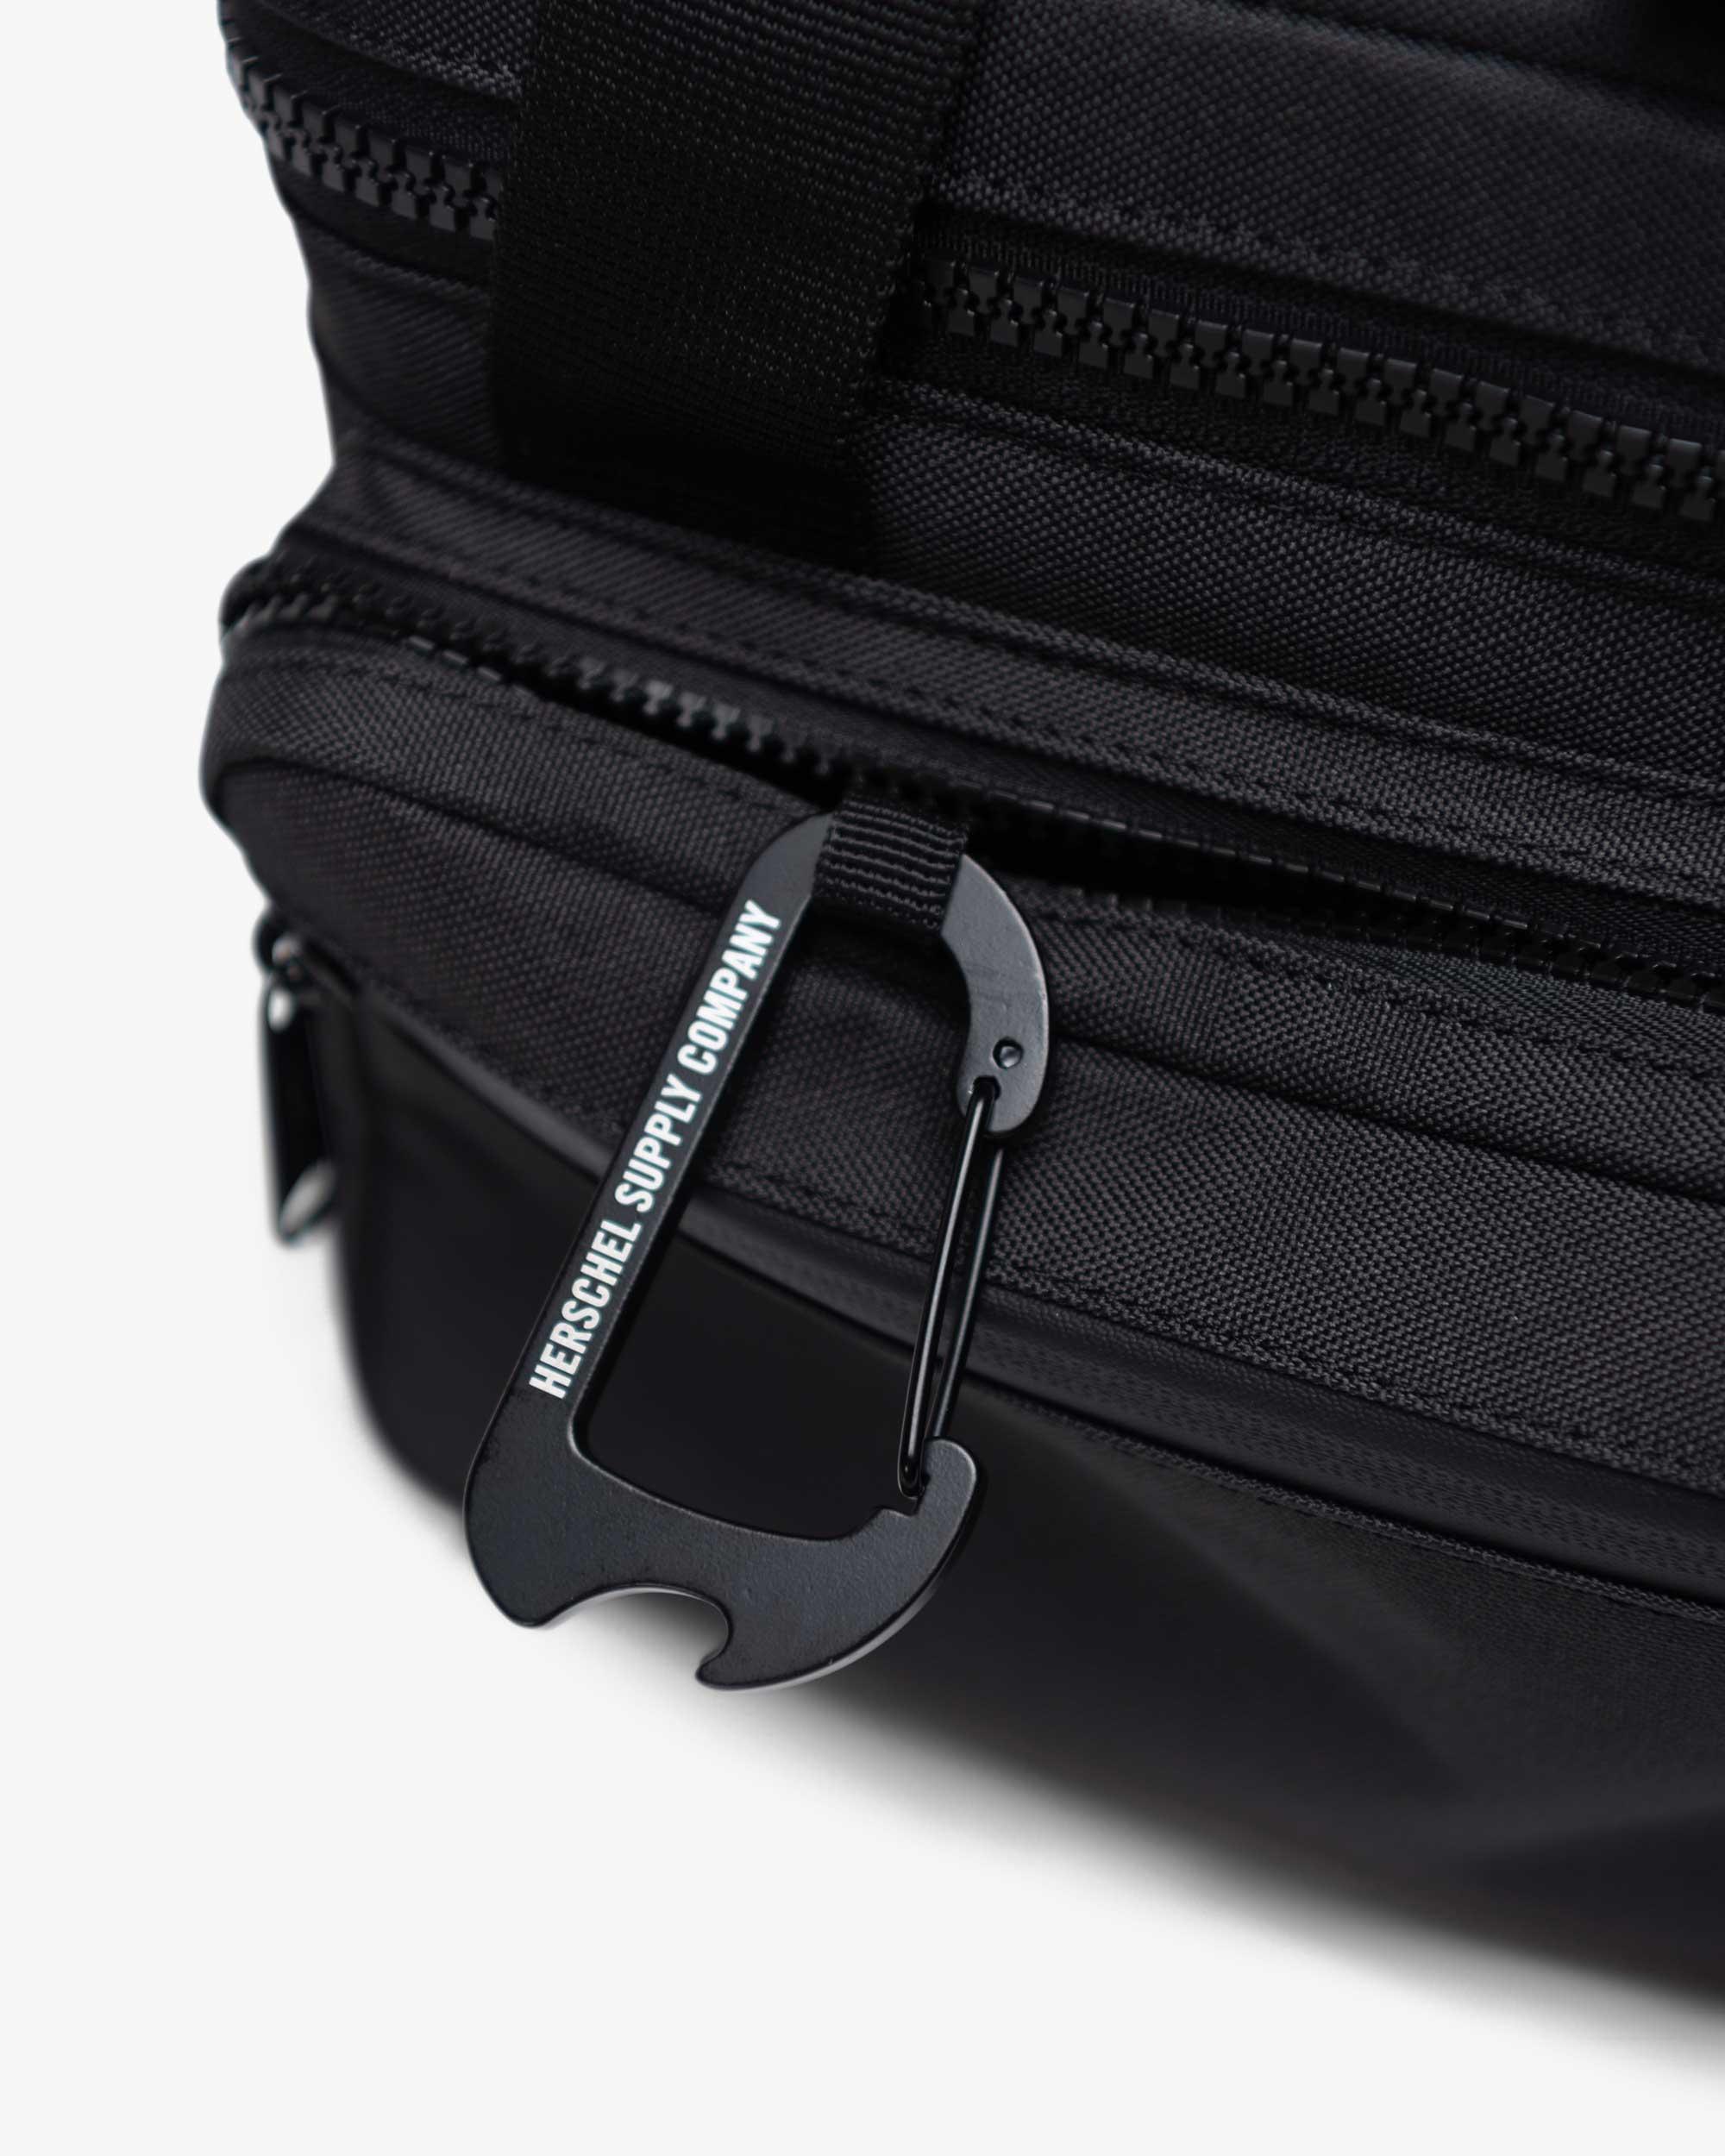 Front pocket with waterproof zipper